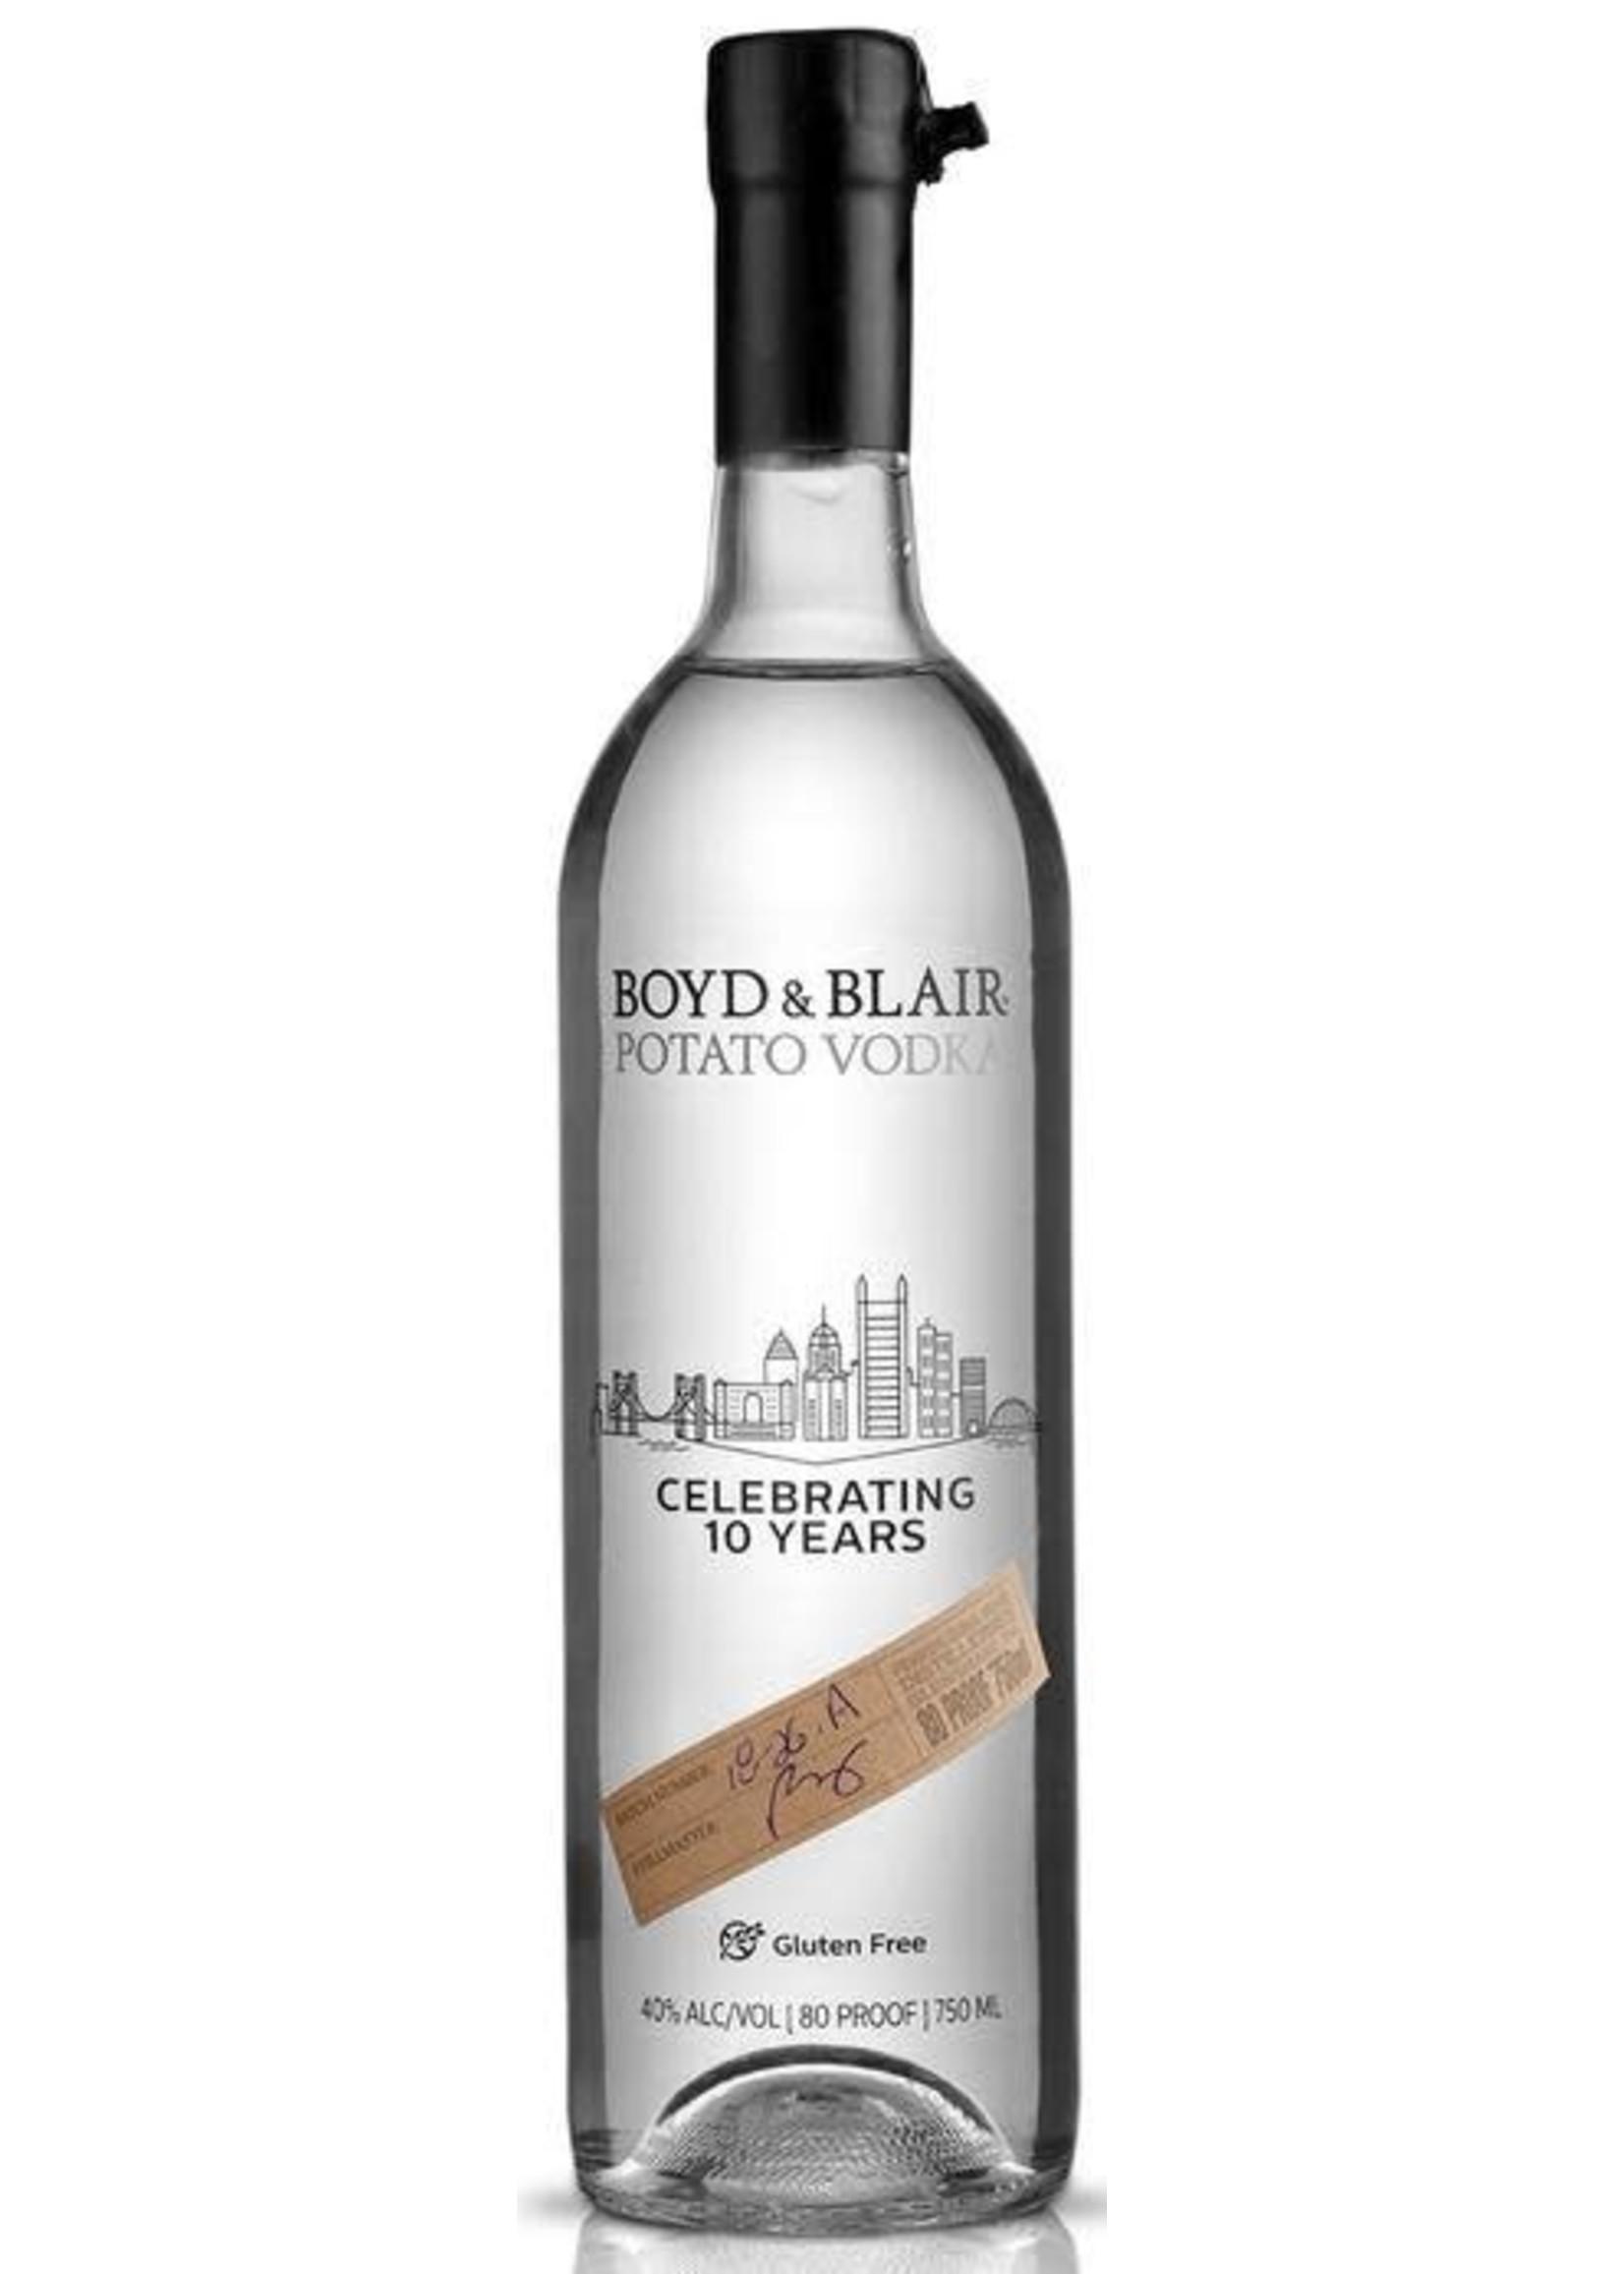 Boyd & Blair Boyd & Blair / Potato Vodka / 750mL